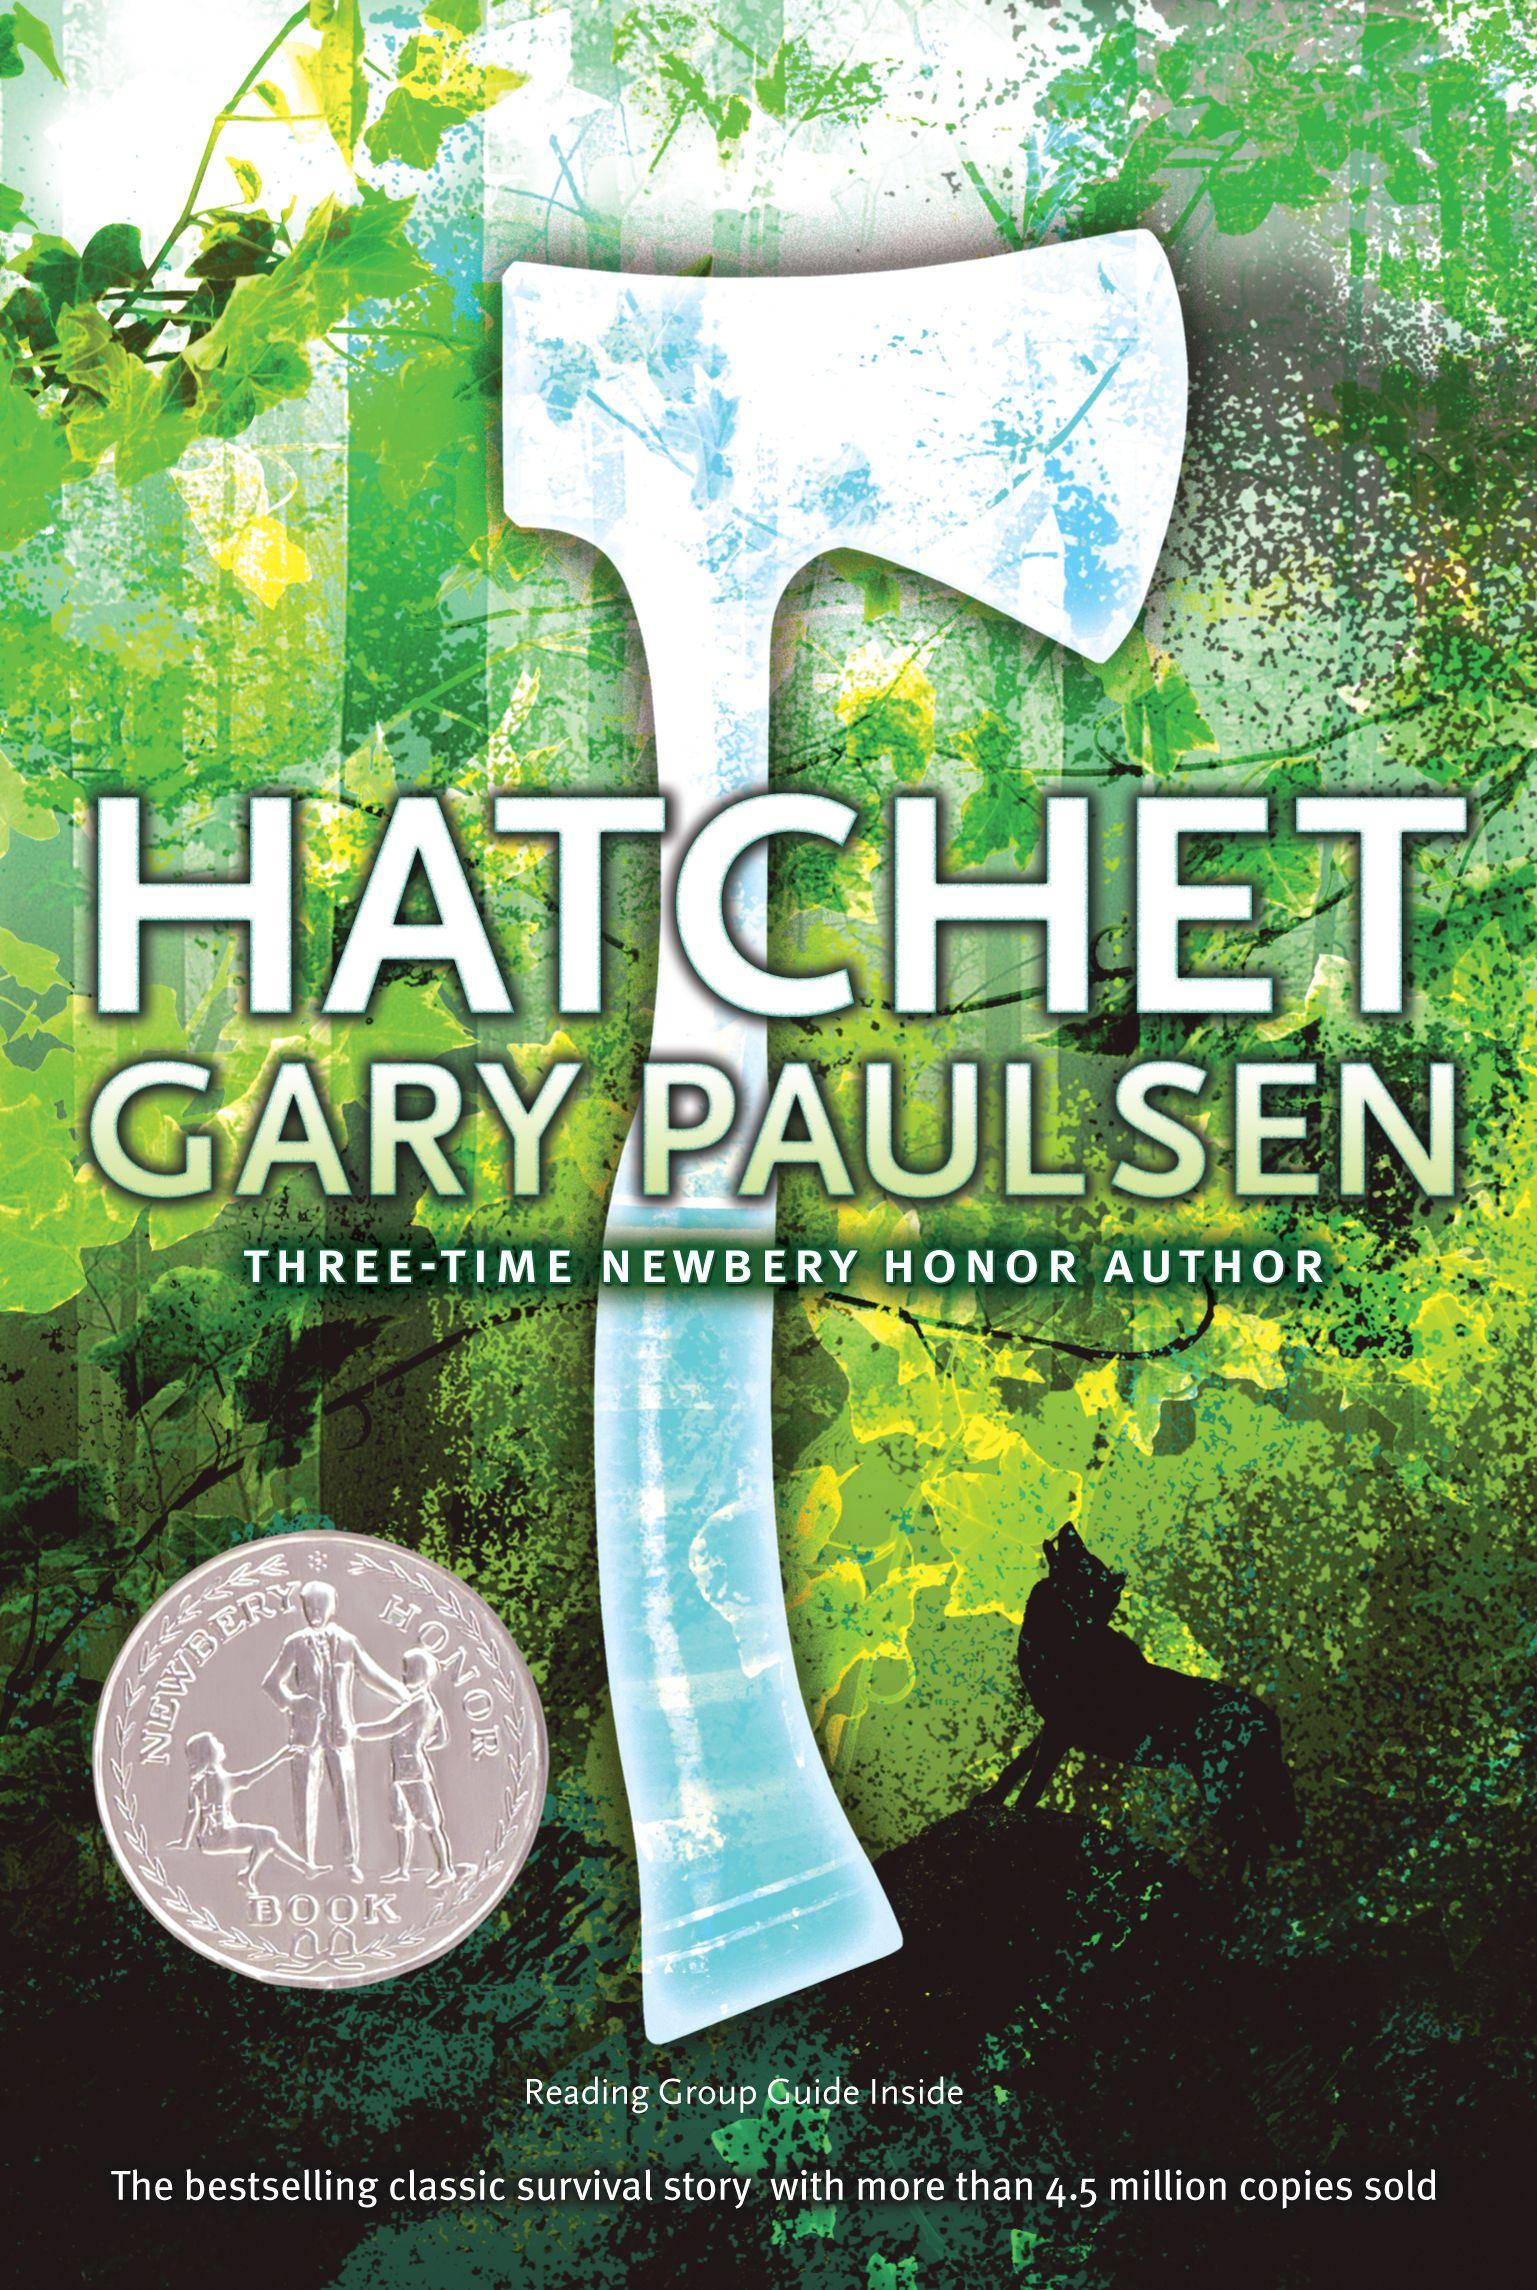 Hatchet Gary Paulsen